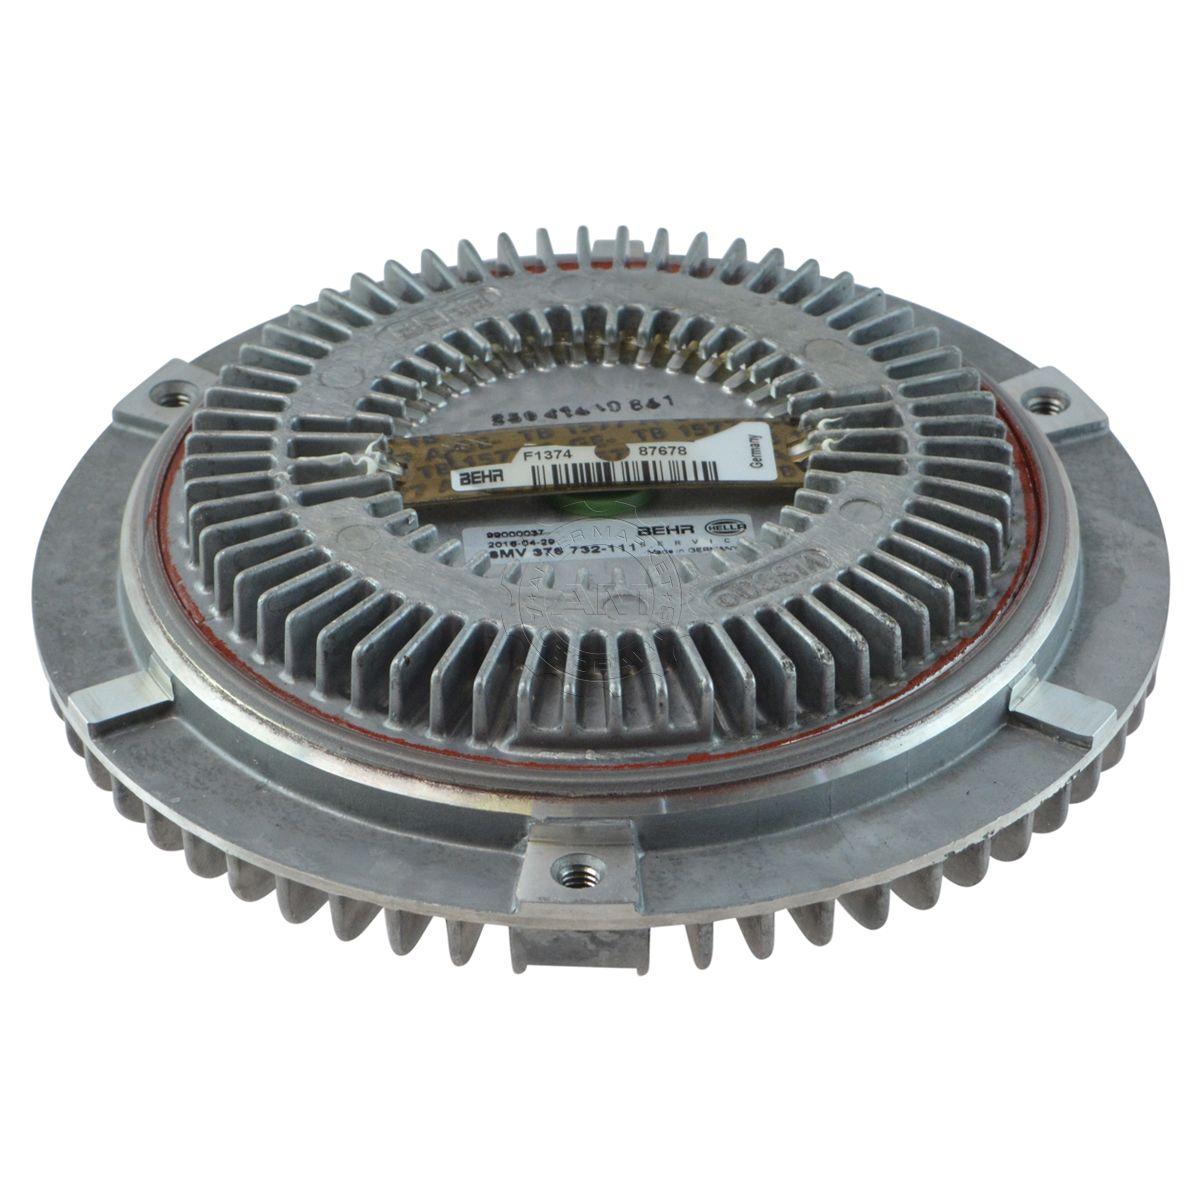 hight resolution of behr 376732111 radiator cooling fan visco clutch for bmw 320i 325i 525i 530i new